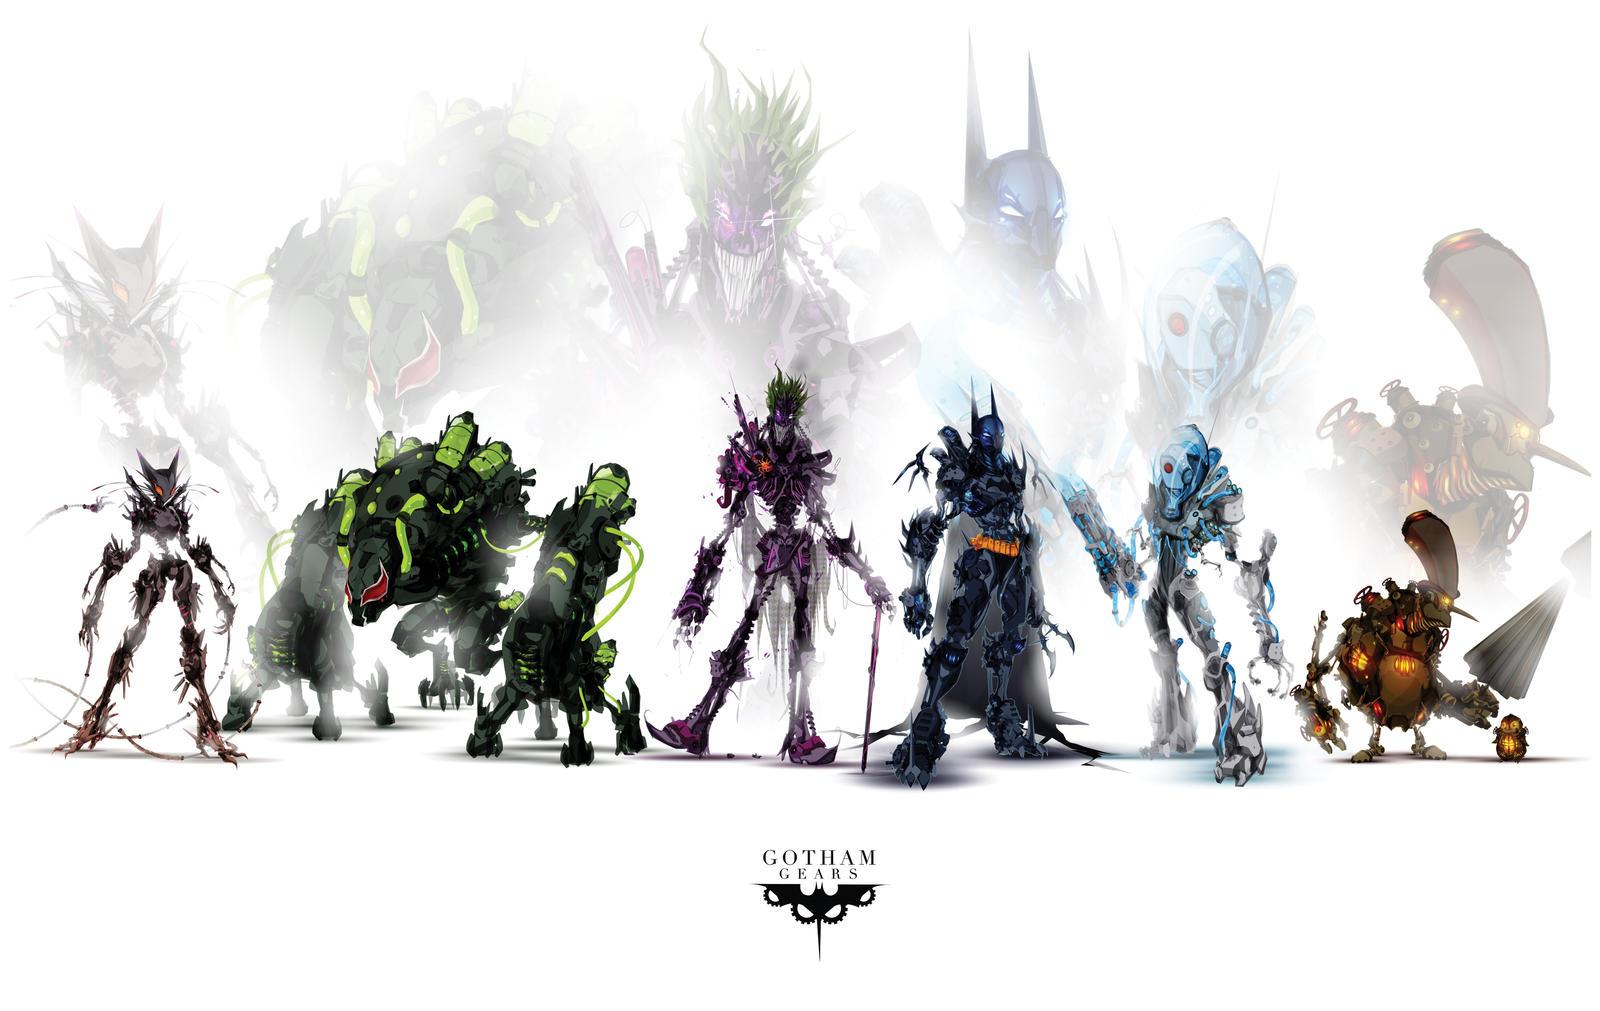 Gotham Gears by ChasingArtwork